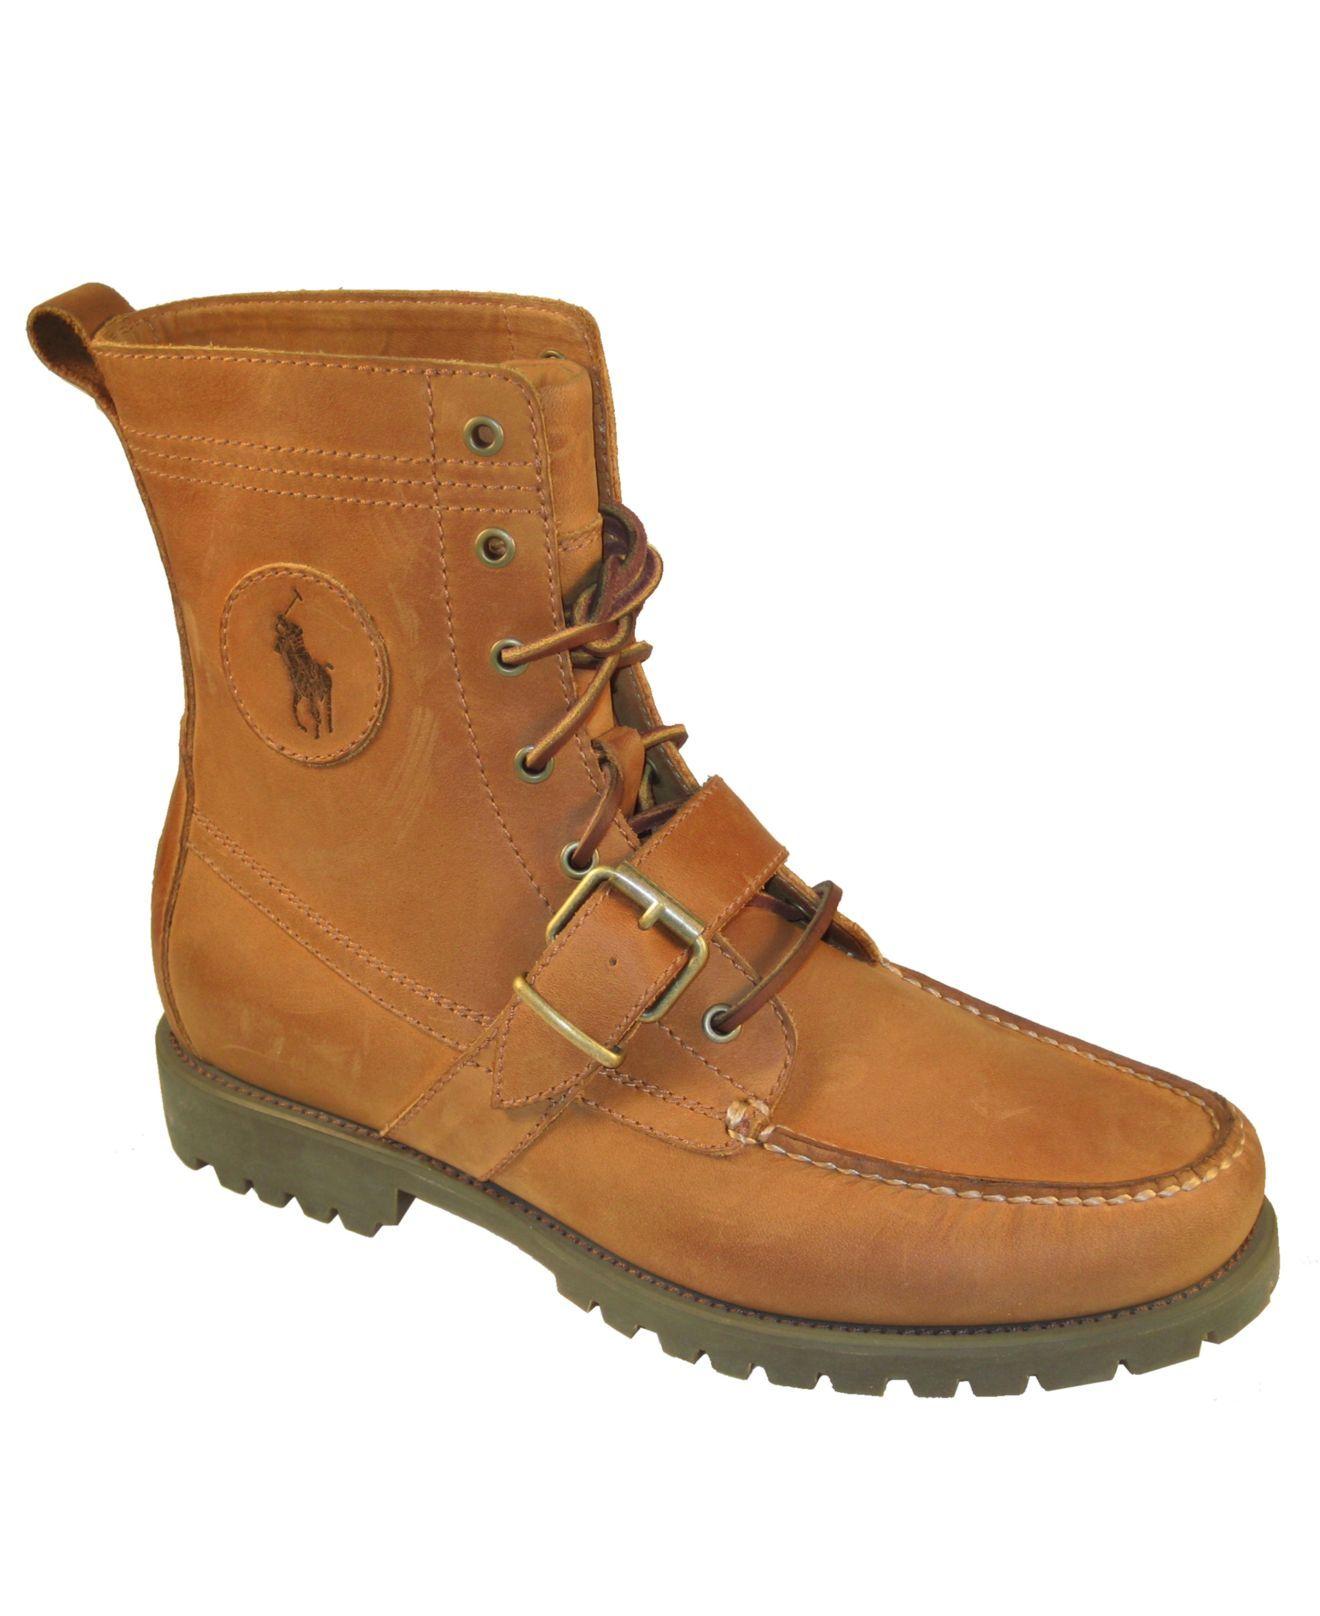 Polo Ralph Lauren Ranger Strap Boots - All Men's Shoes - Men - Macy's